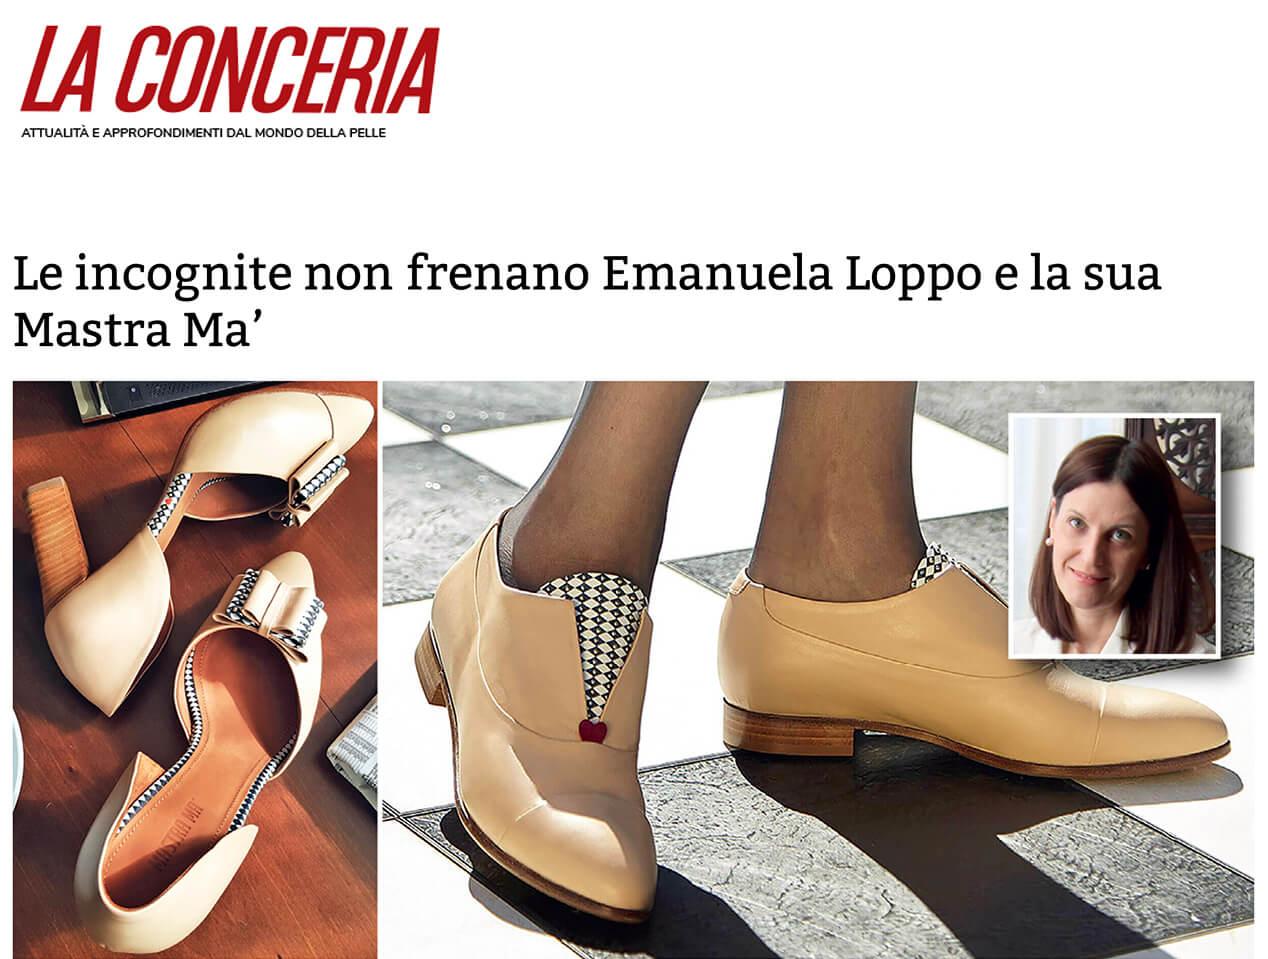 La Conceria interviews Mastra Ma'